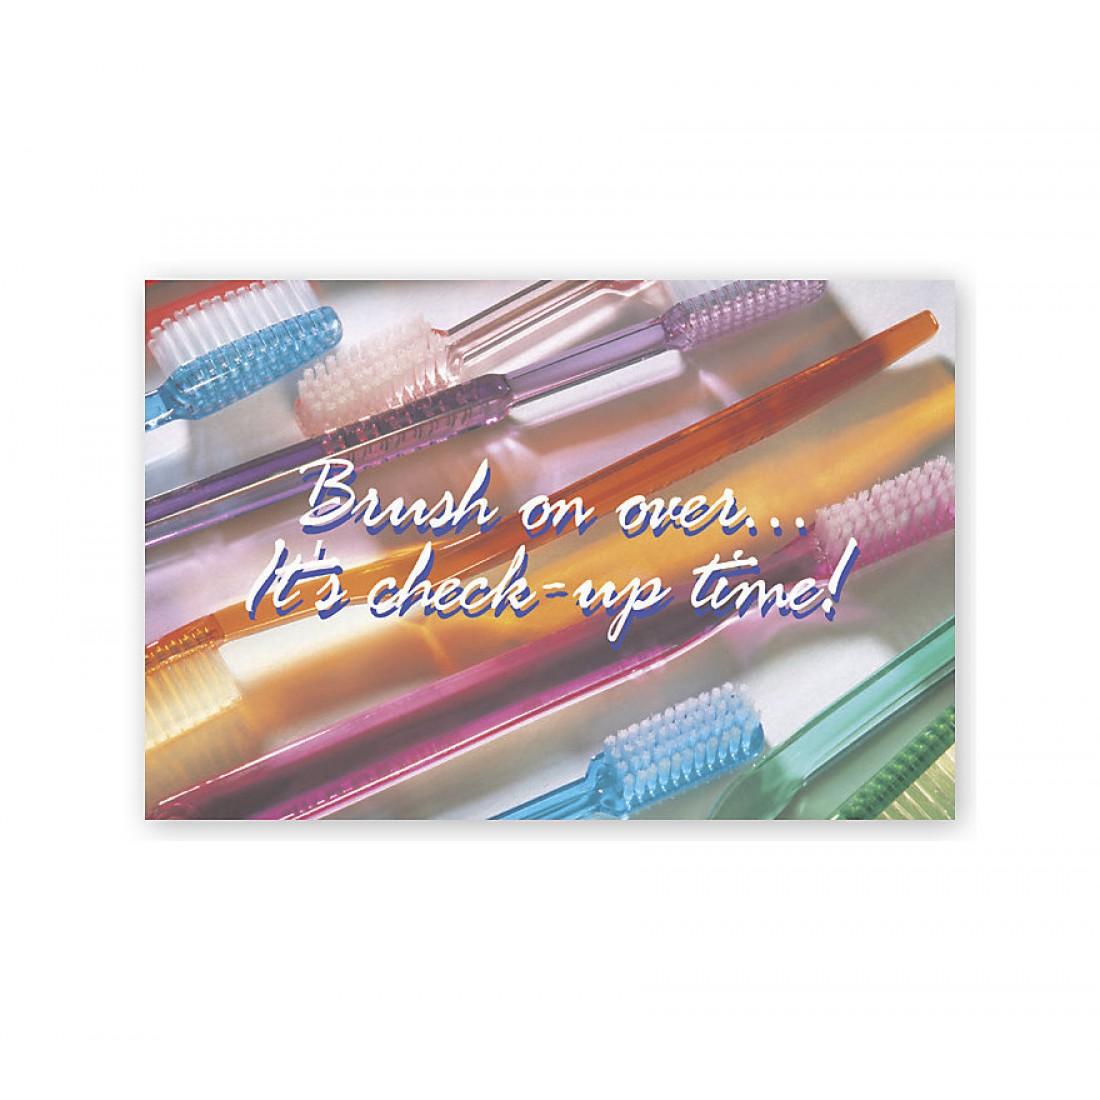 Dental Laser Postcards Brush On Over It's Check Up Time